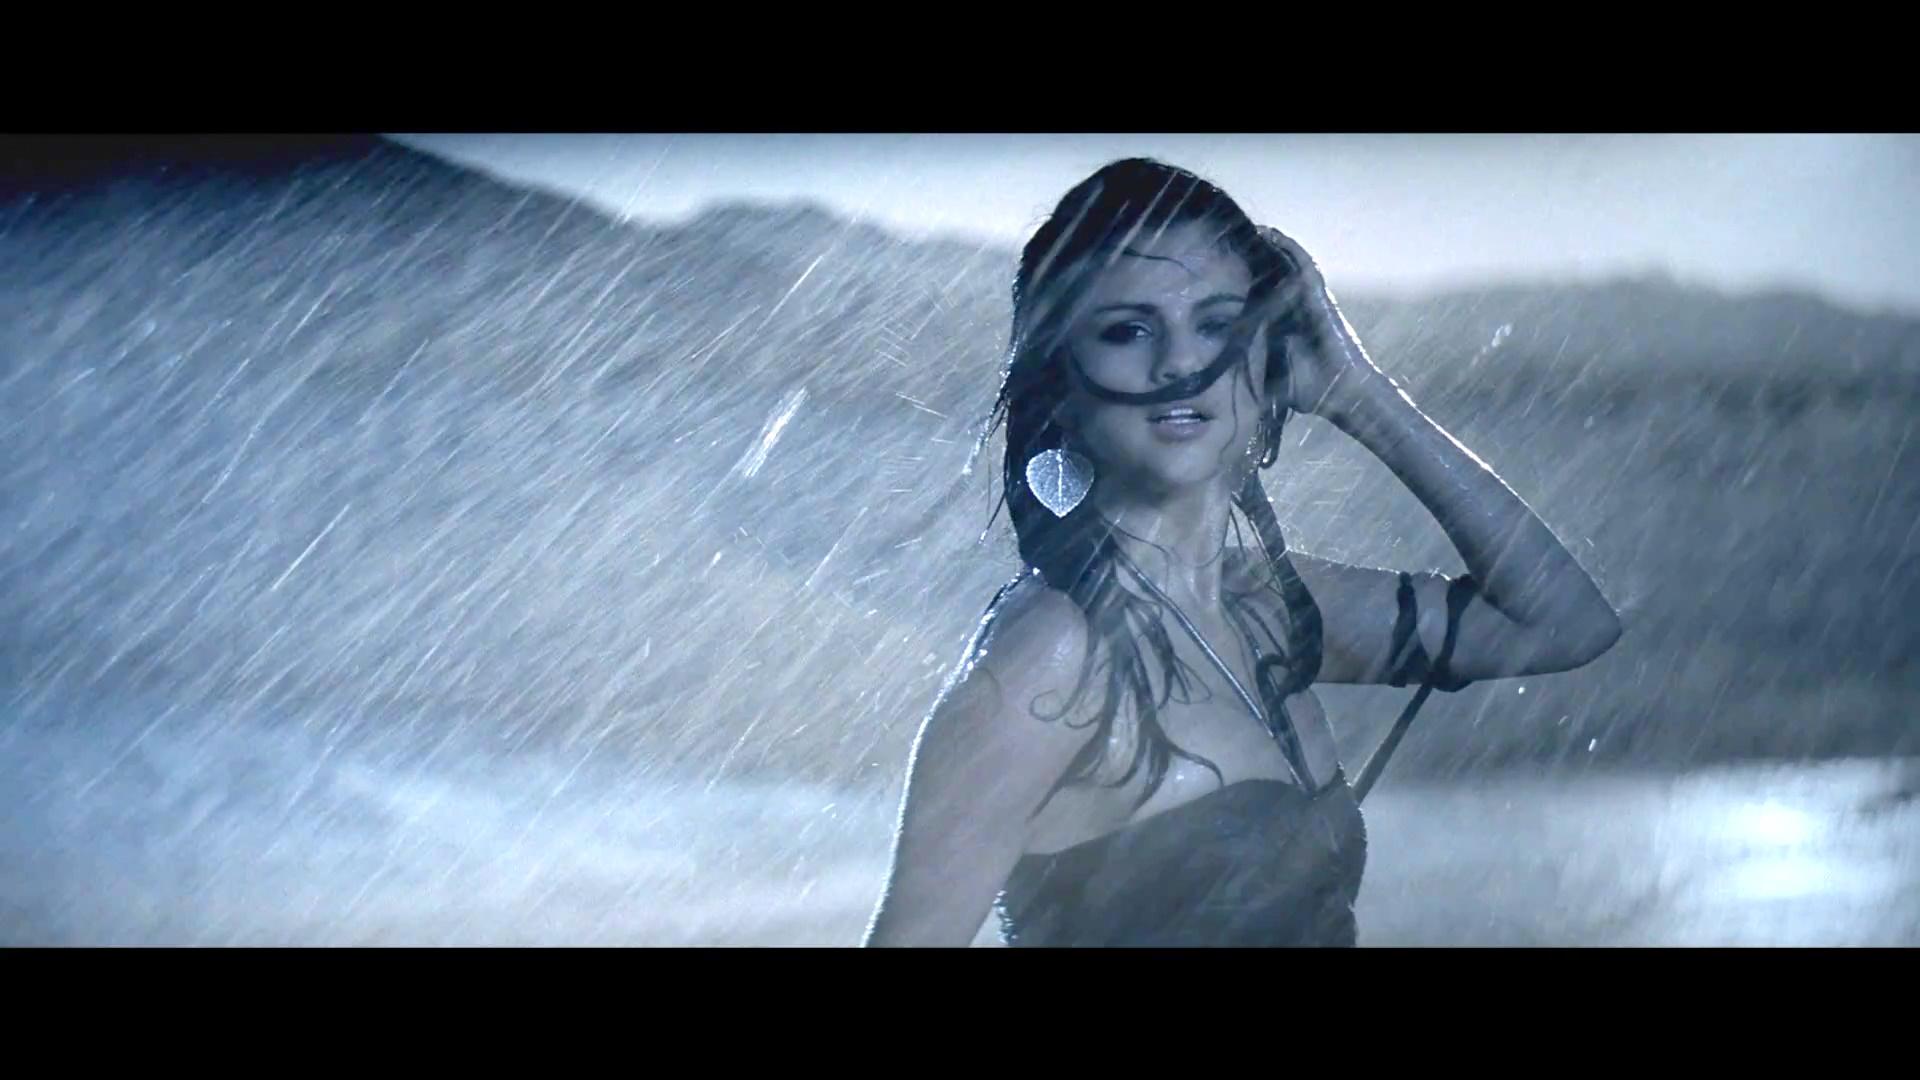 selena gomez in rain wallpaper | wide screen wallpaper 1080p,2k,4k